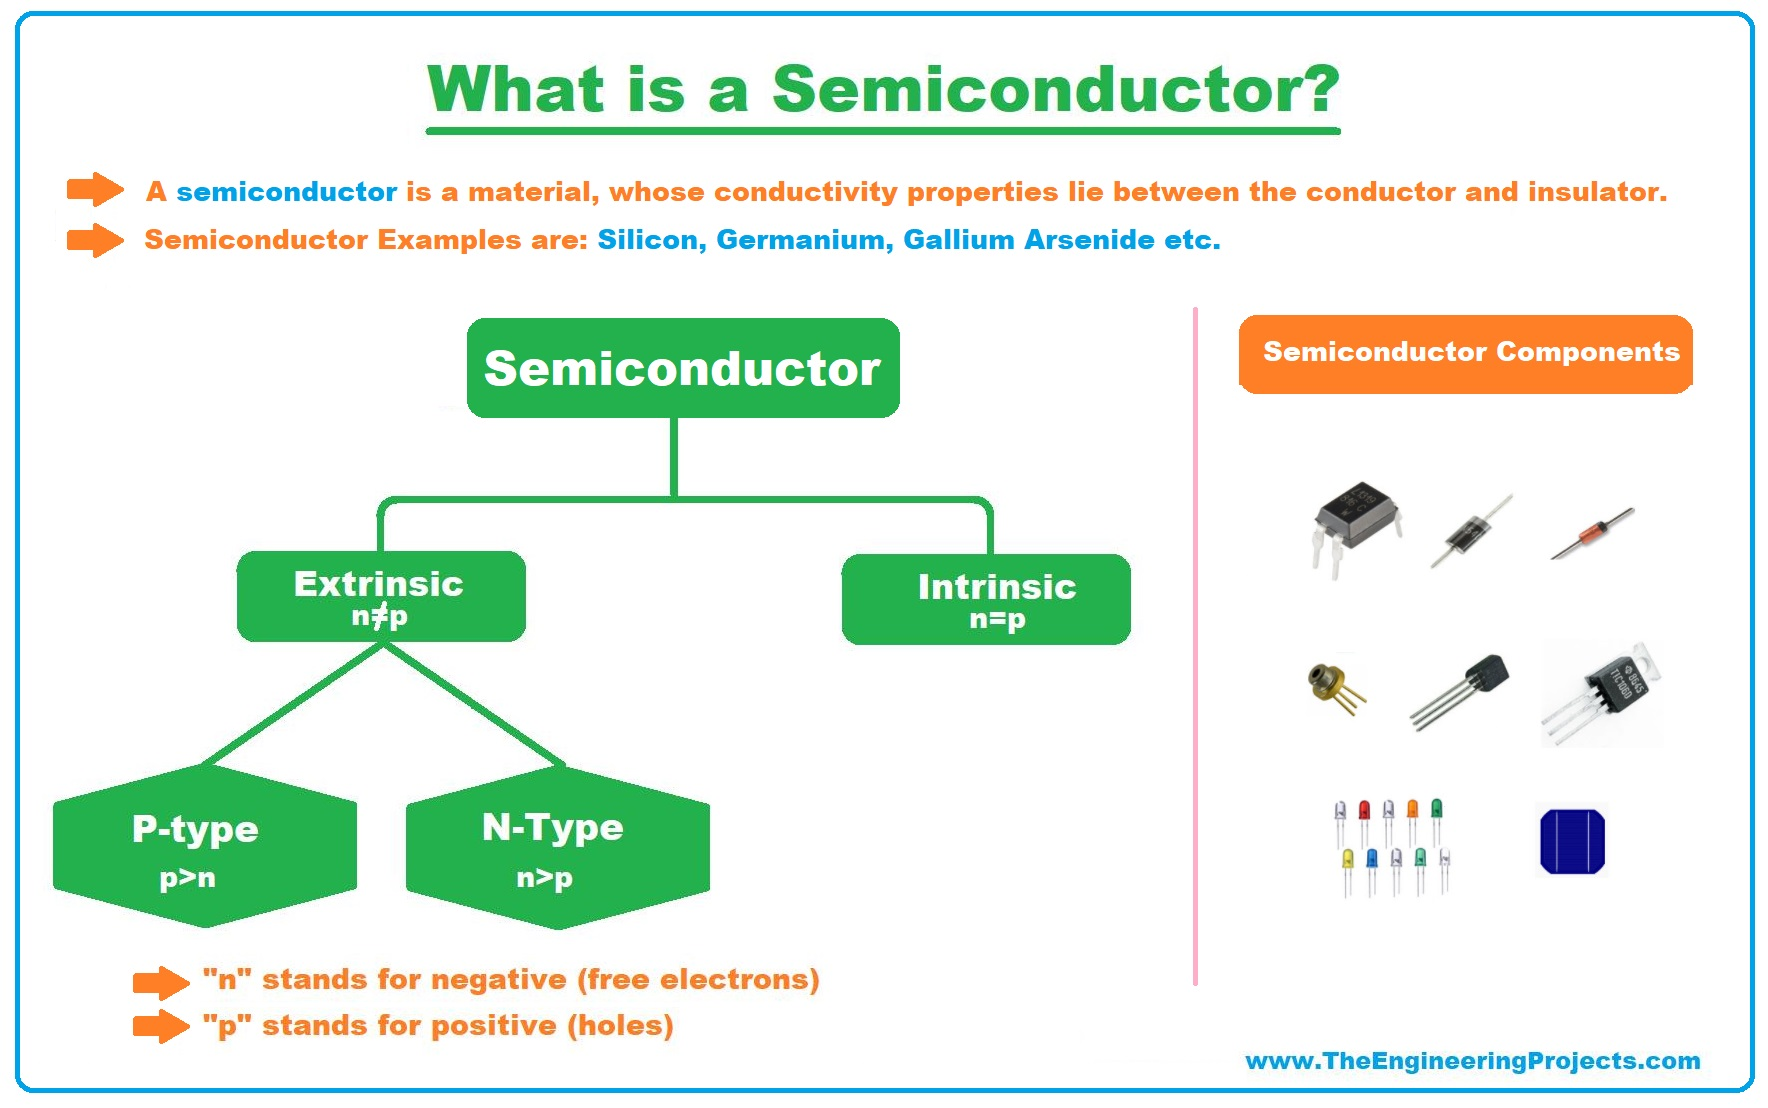 semiconductors, semiconductor, what is semiconductors, types of semiconductors, p type semiconductors, n type semiconductors, semiconductor applications, semiconductor examples, semiconductor material